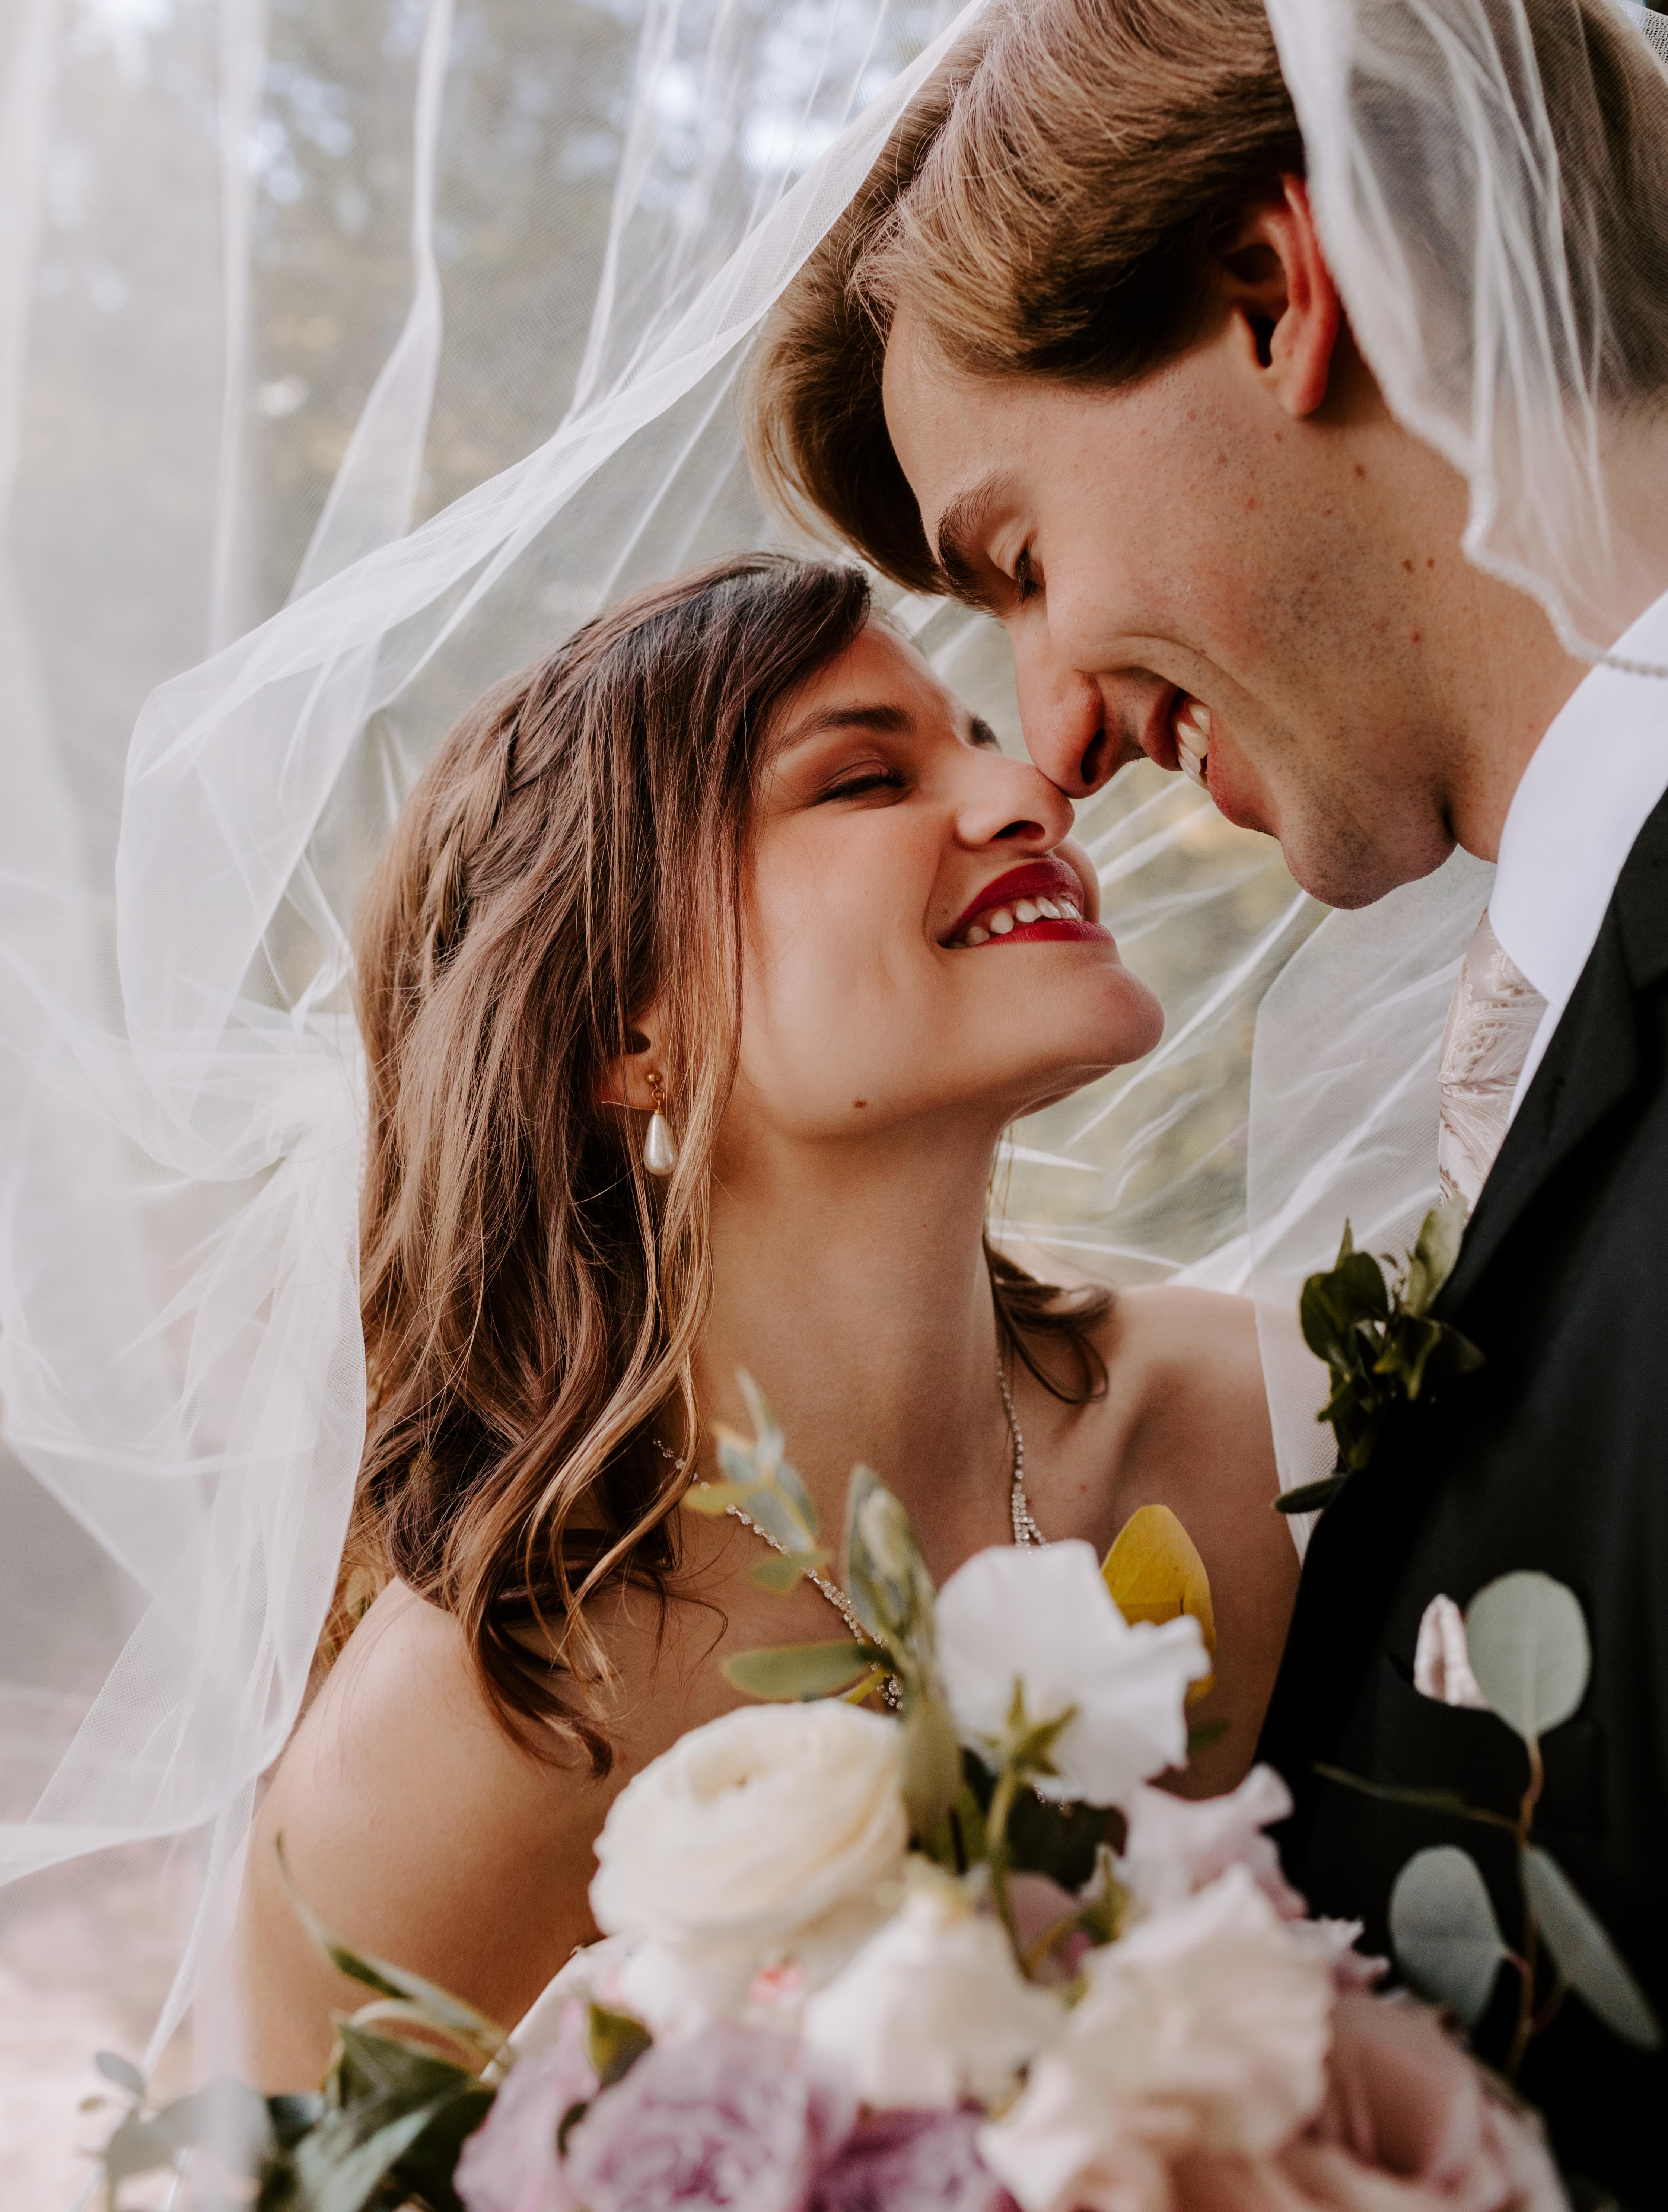 Fort Smith Arkansas bride and groom under veil